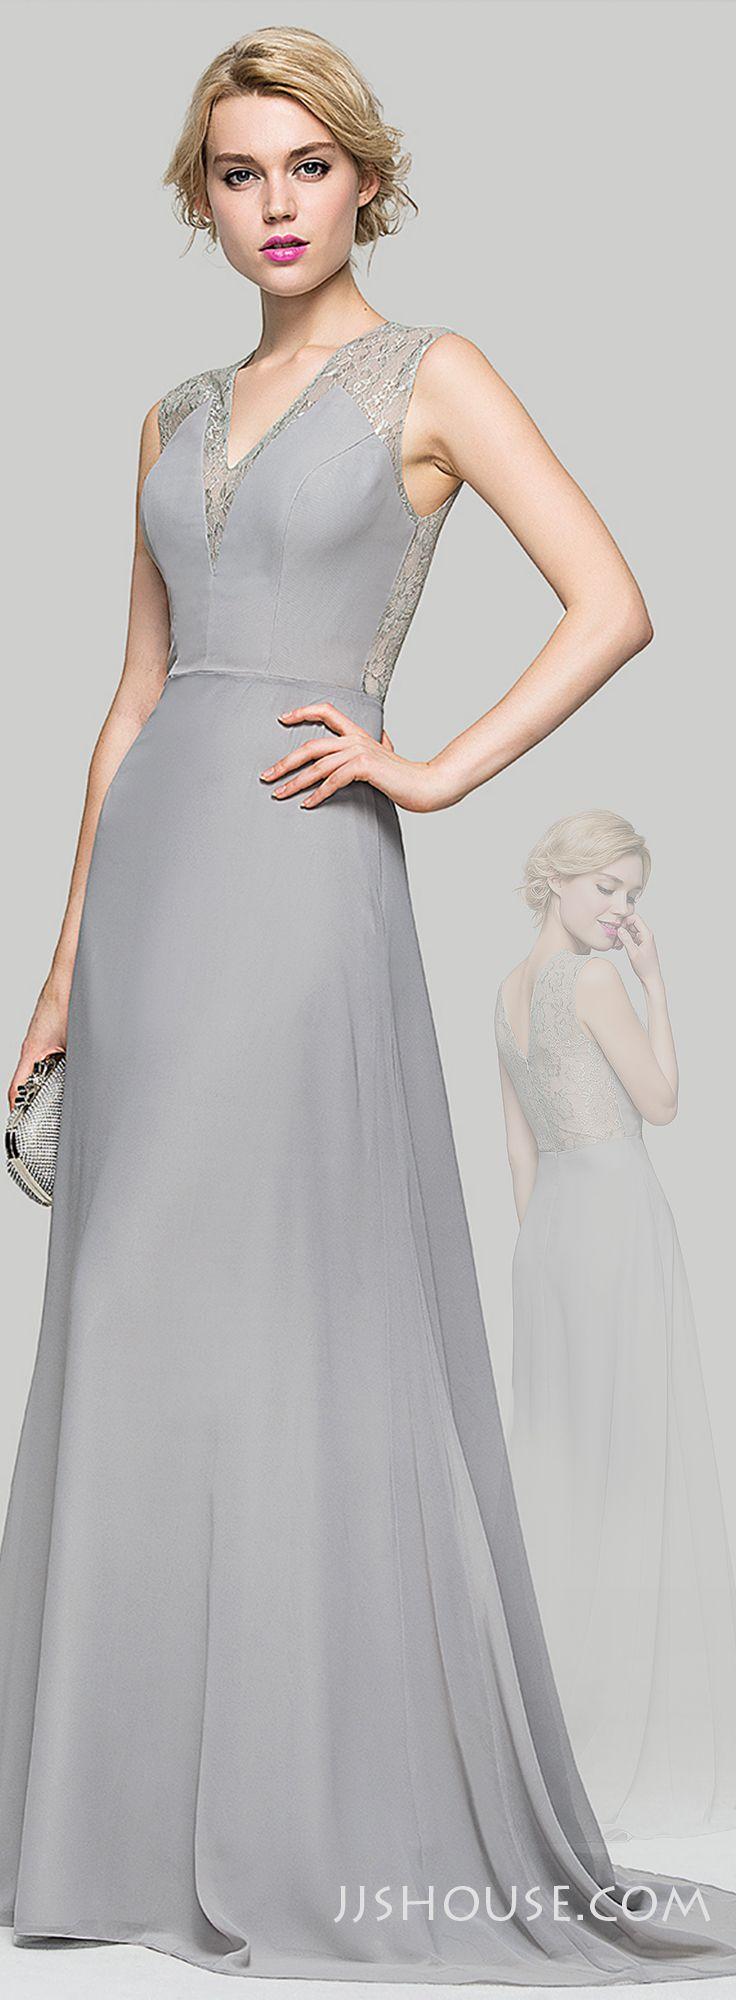 Alineprincess vneck sweep train chiffon evening dress